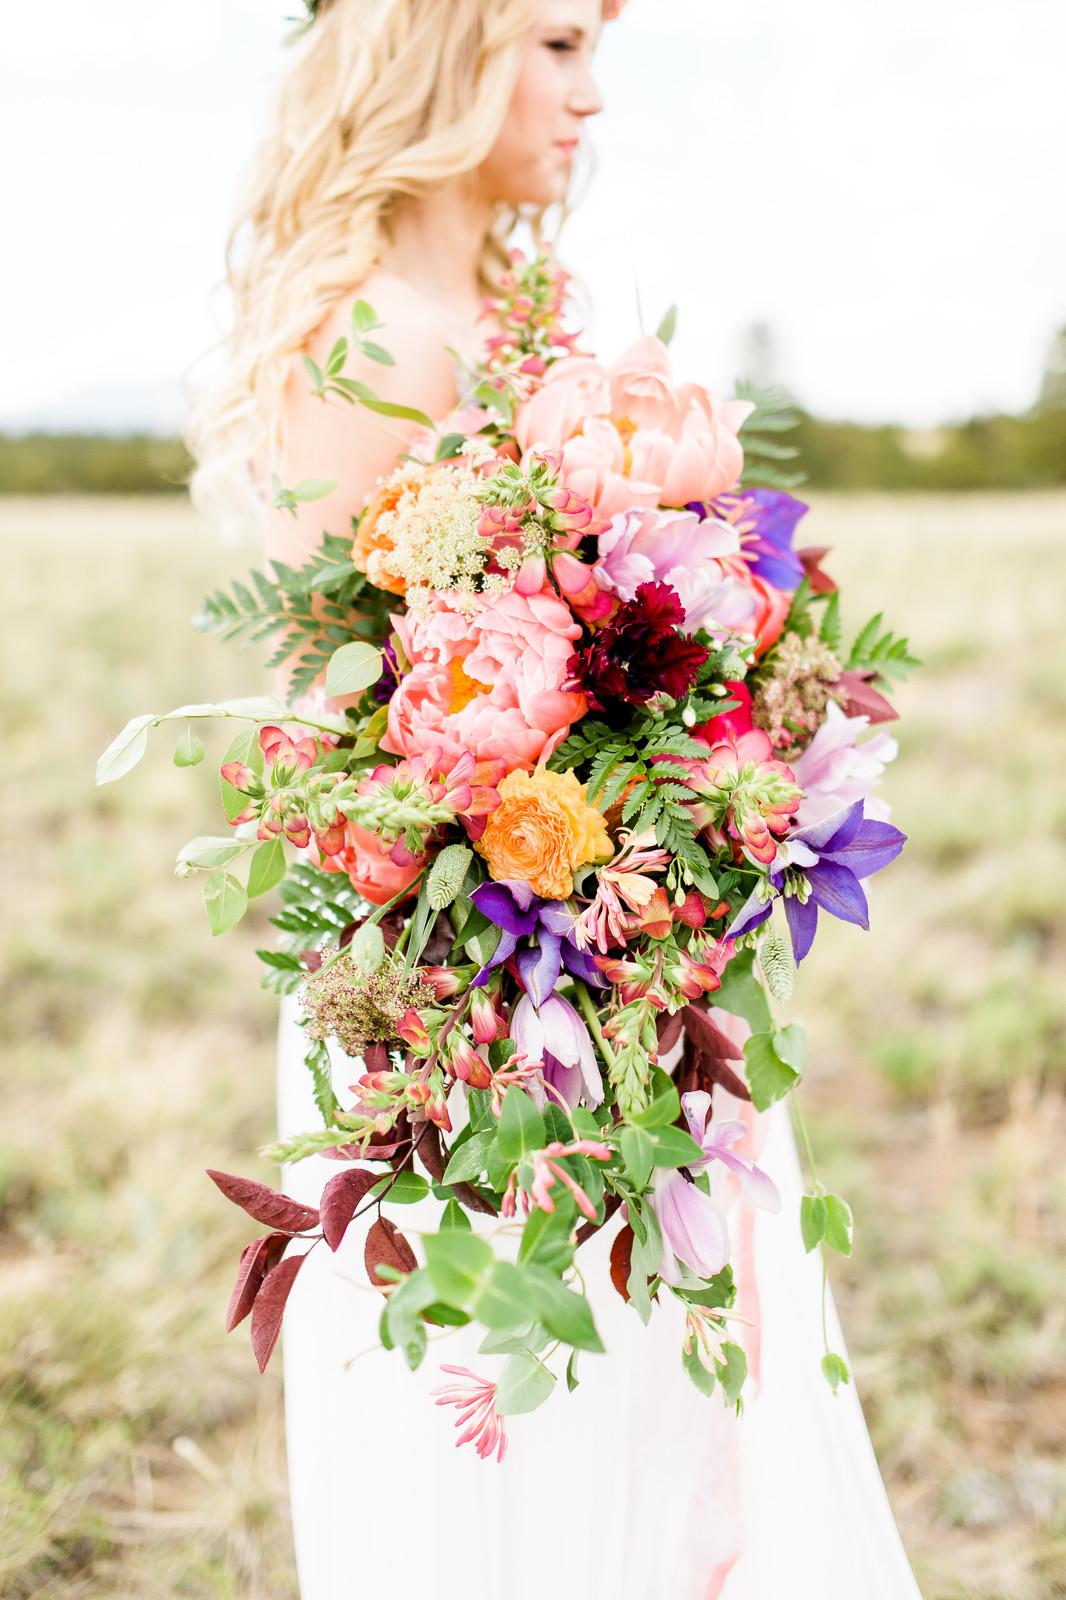 Emma lea floral denver colorado wedding florist hot springs emma lea floral sarah jayne photography mt princeton colorado wedding peony mightylinksfo